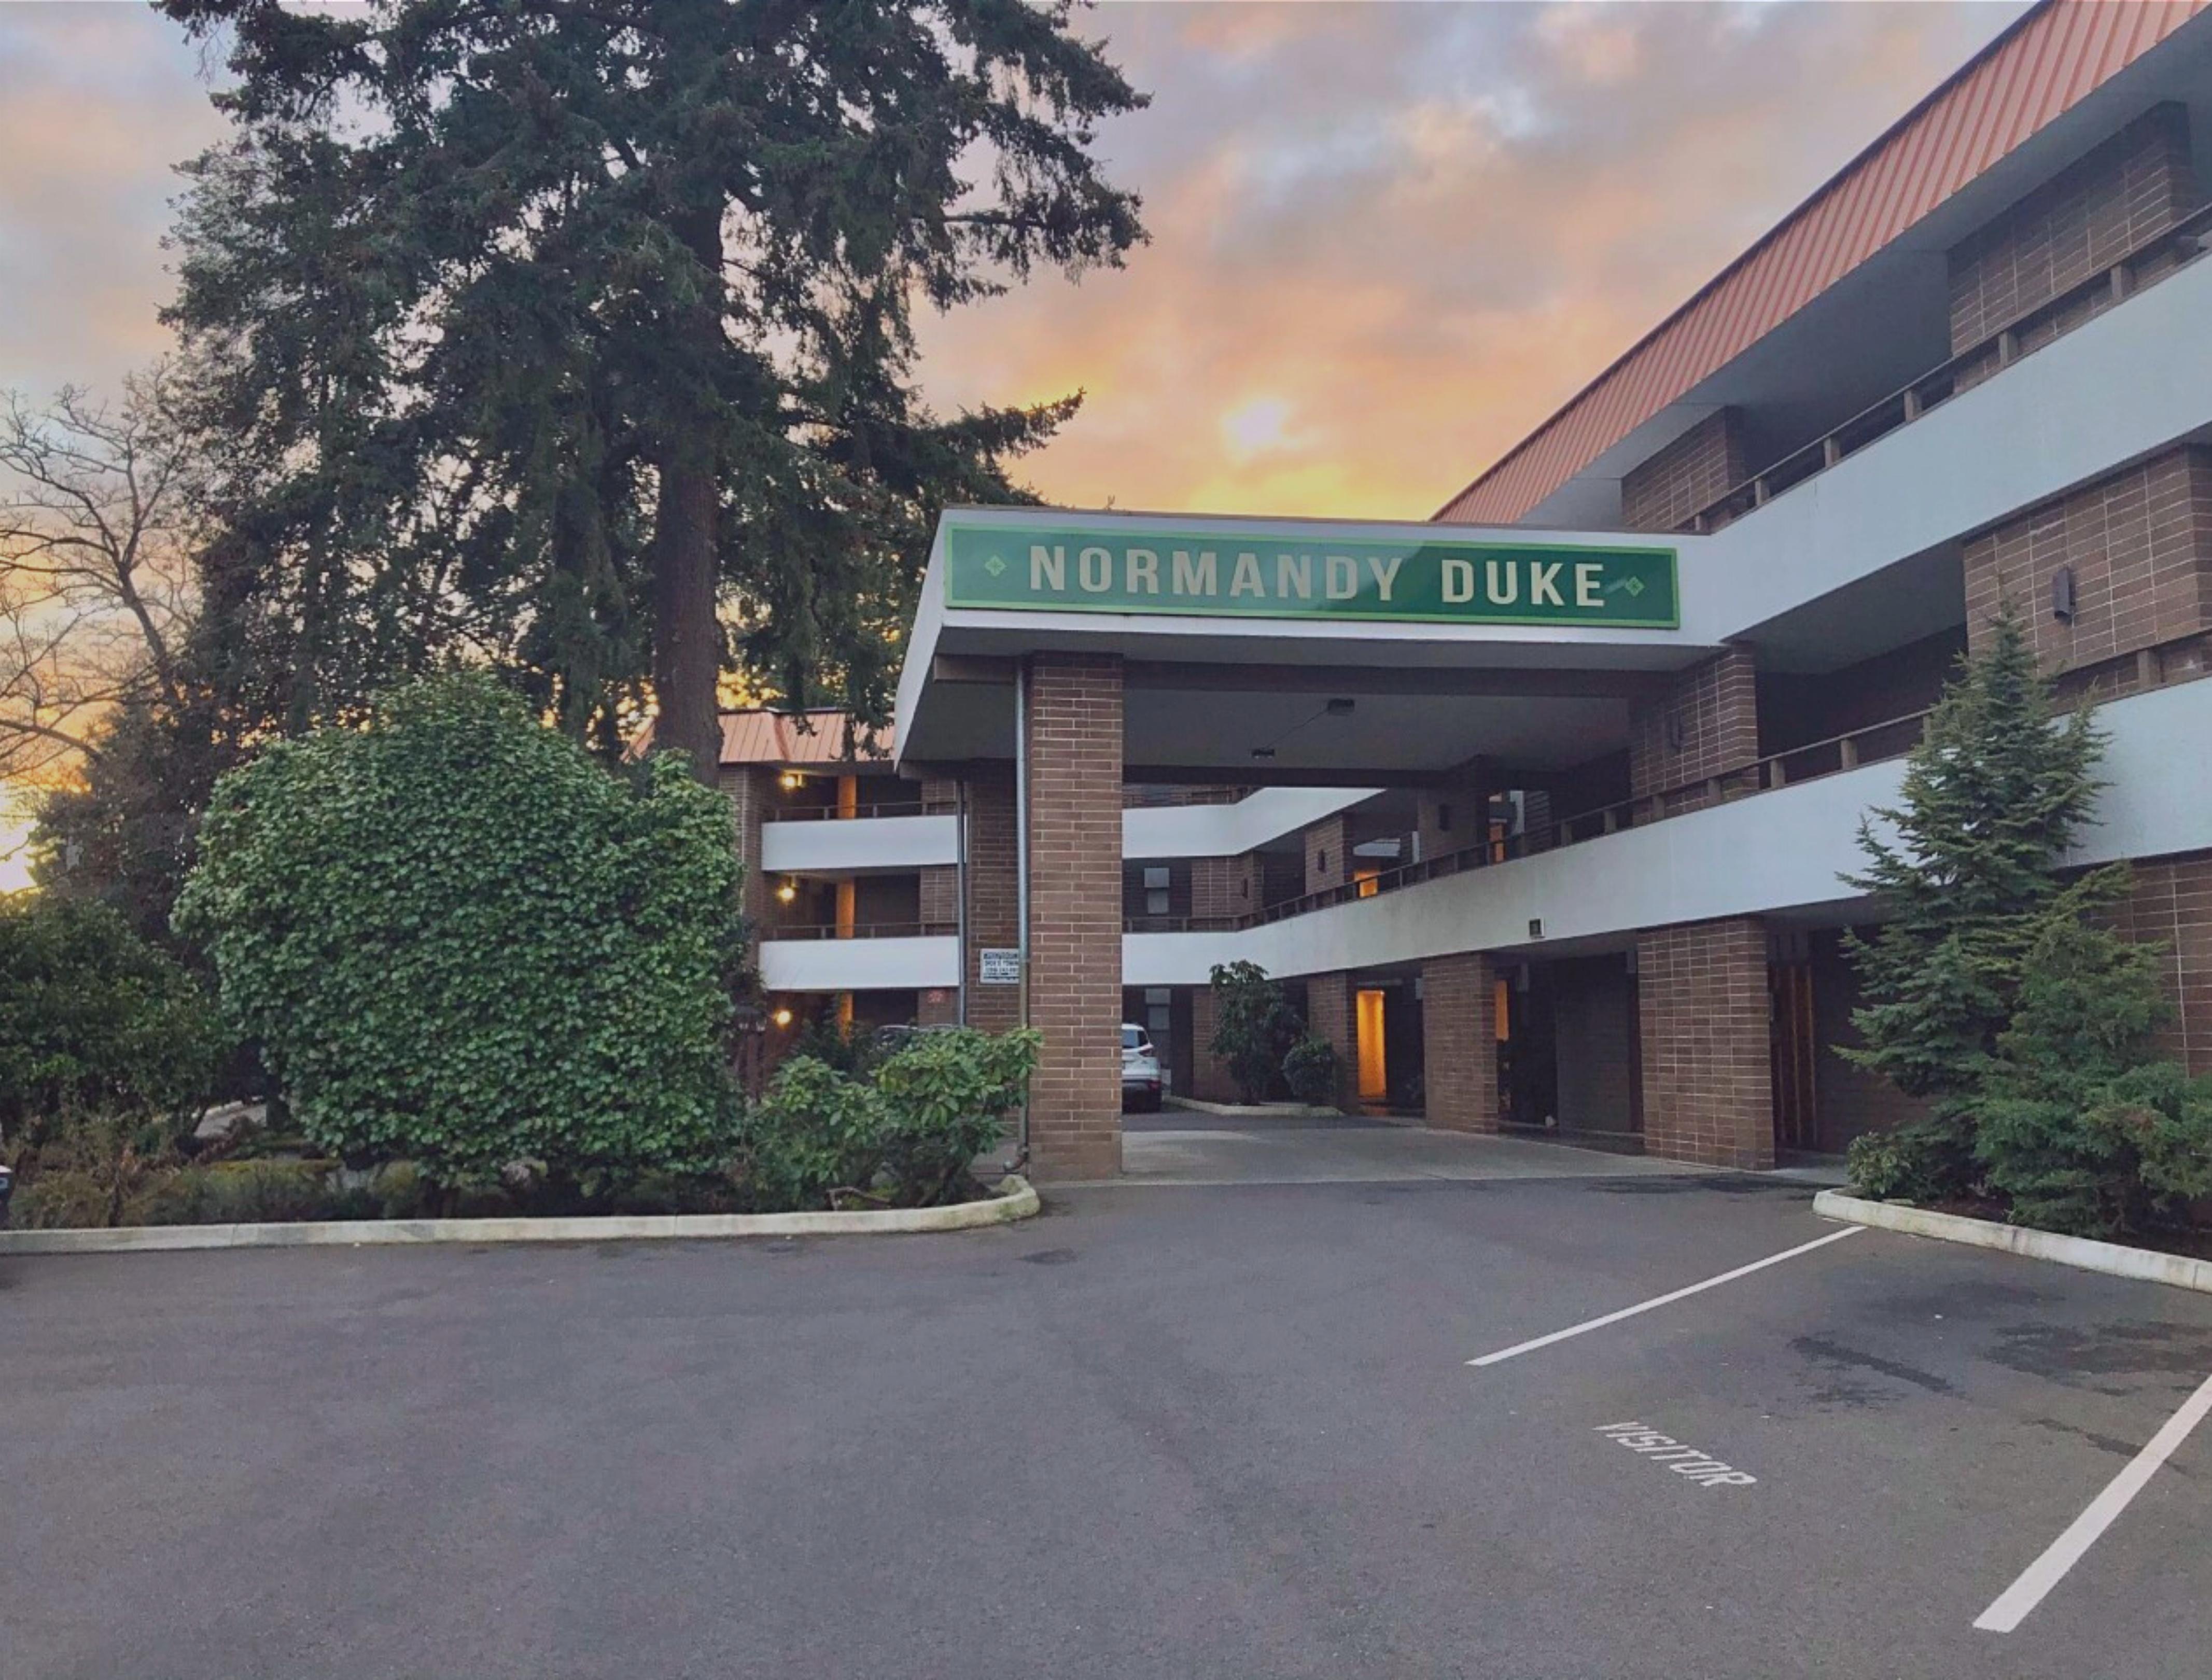 Normandy Duke Apartments Exterior Seattle WA